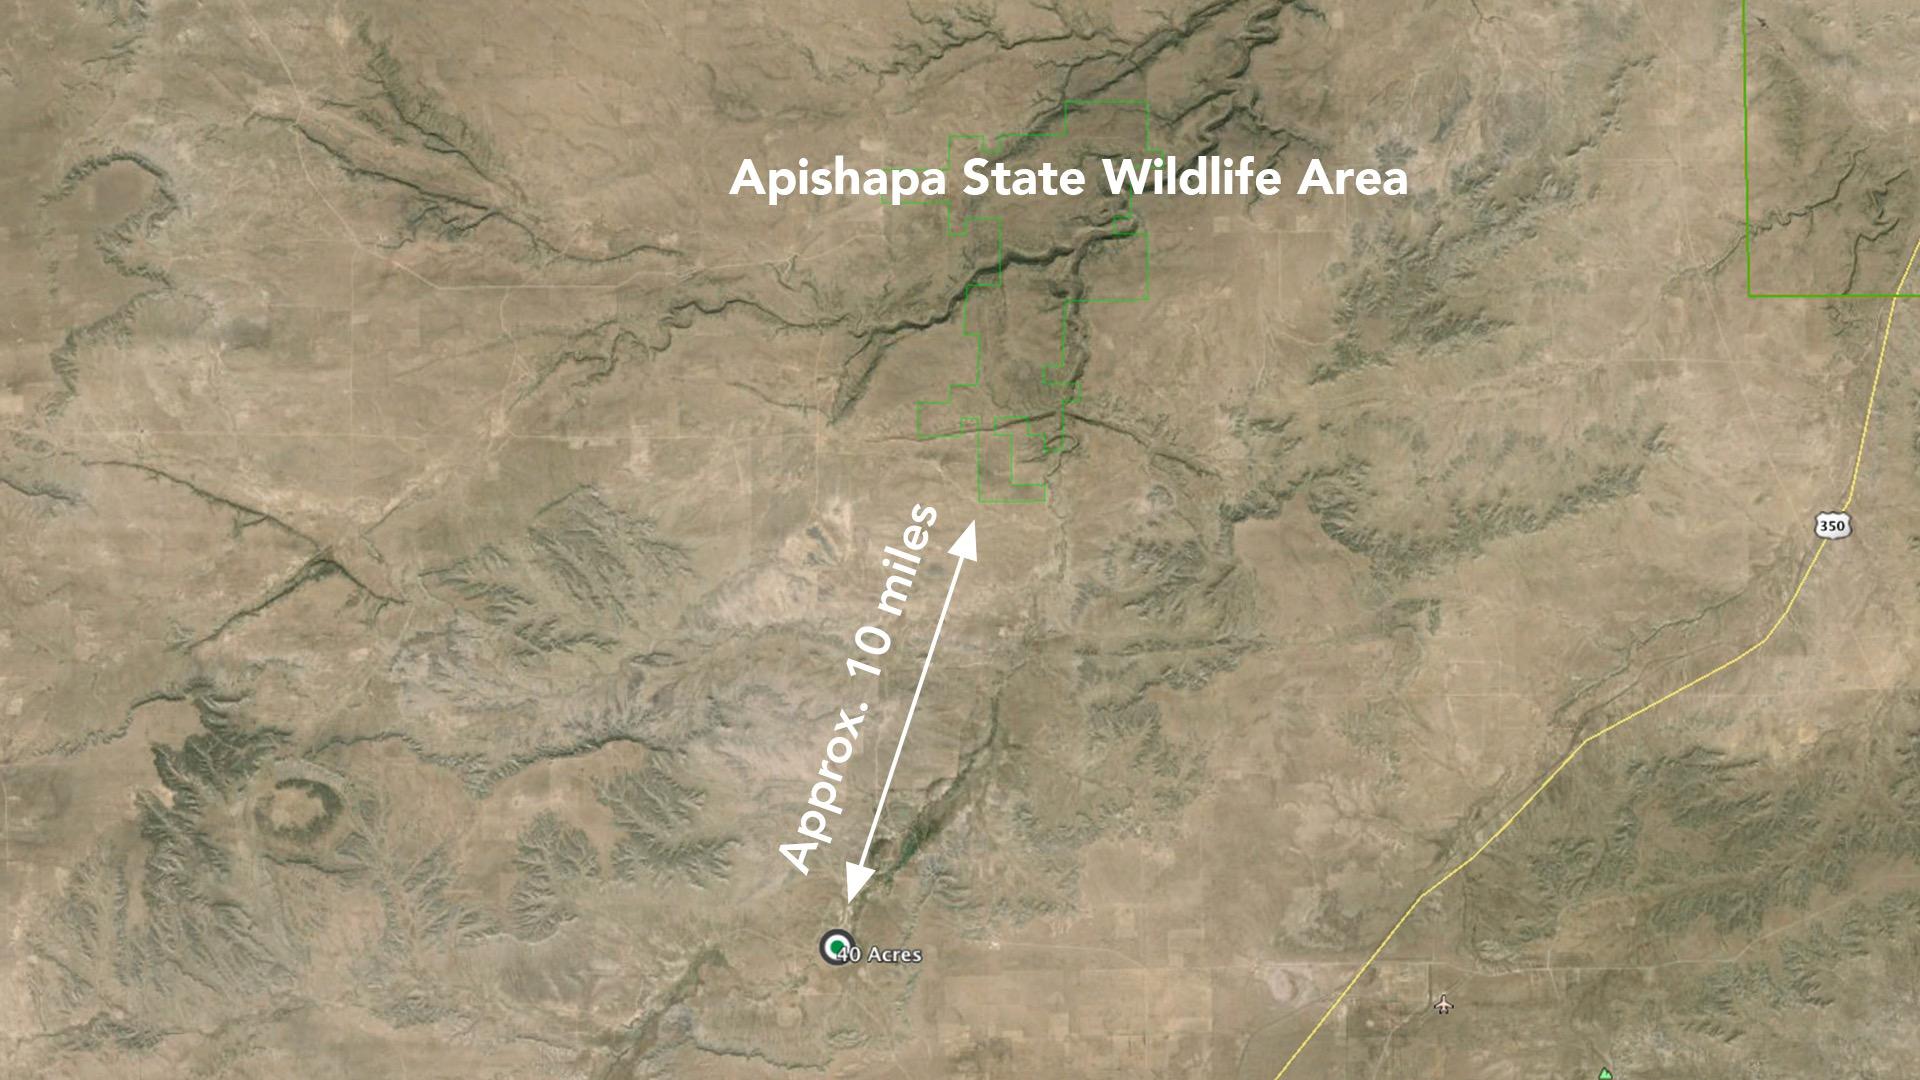 Approximately 10 miles to the Apishapa State Wildlife Area